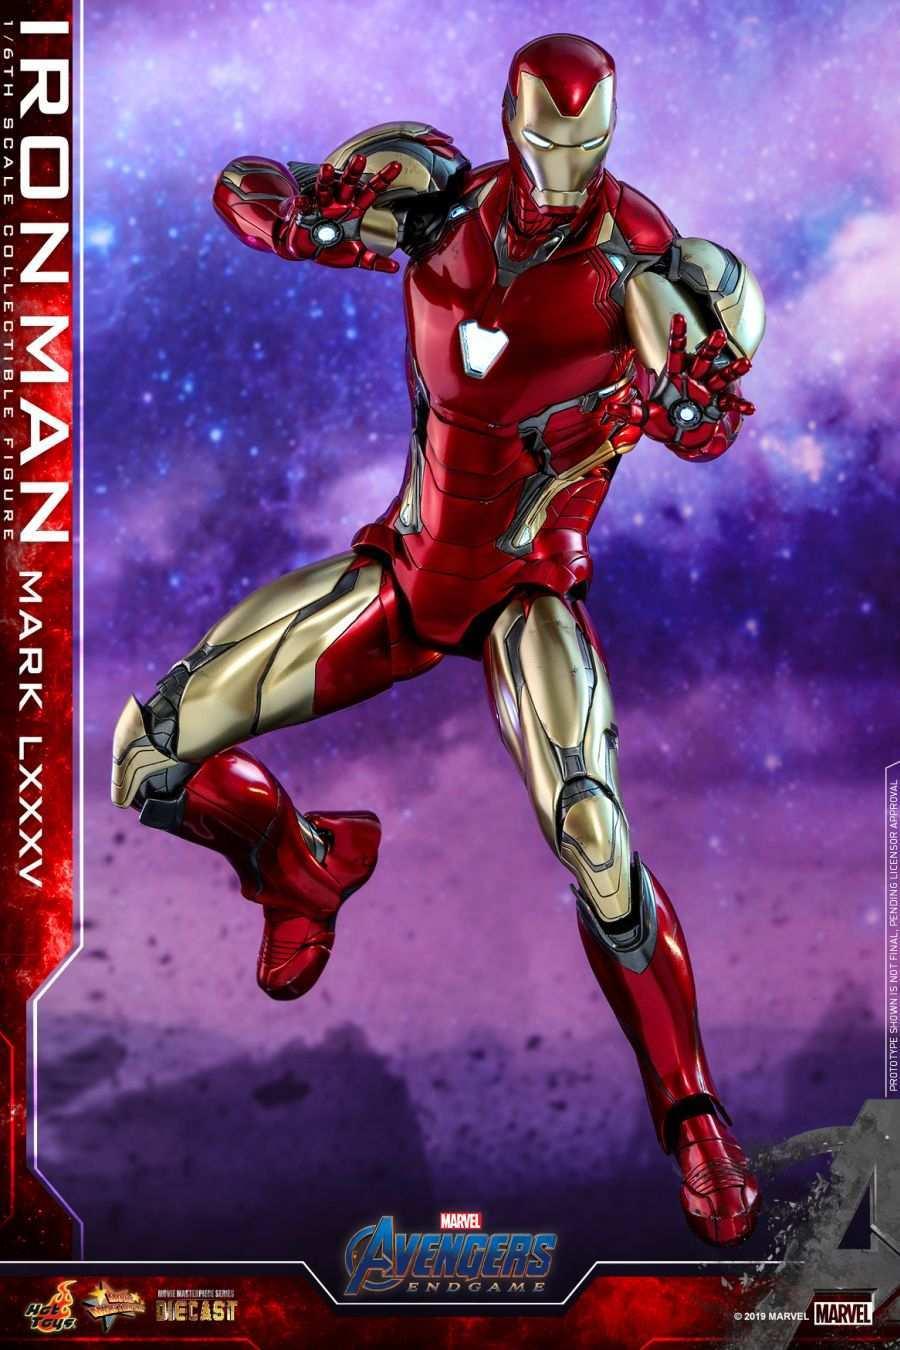 Hot Toys - Avengers 4 - Iron Man Mark LXXXV collectible figure_PR4